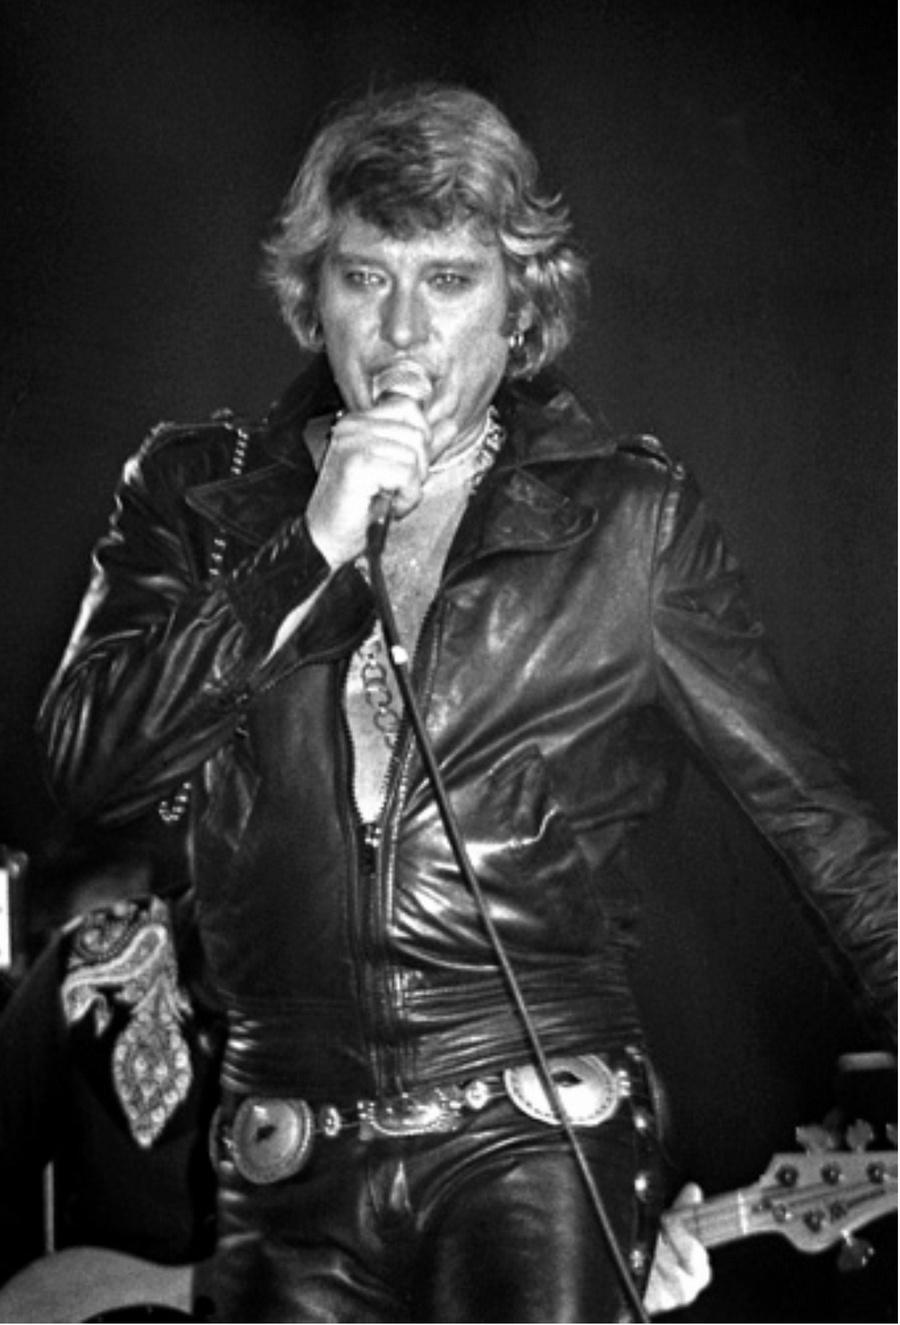 LES CONCERTS DE JOHNNY 'TOURNEE NIGHT RIDER BAND TOUR 1981' Captu906